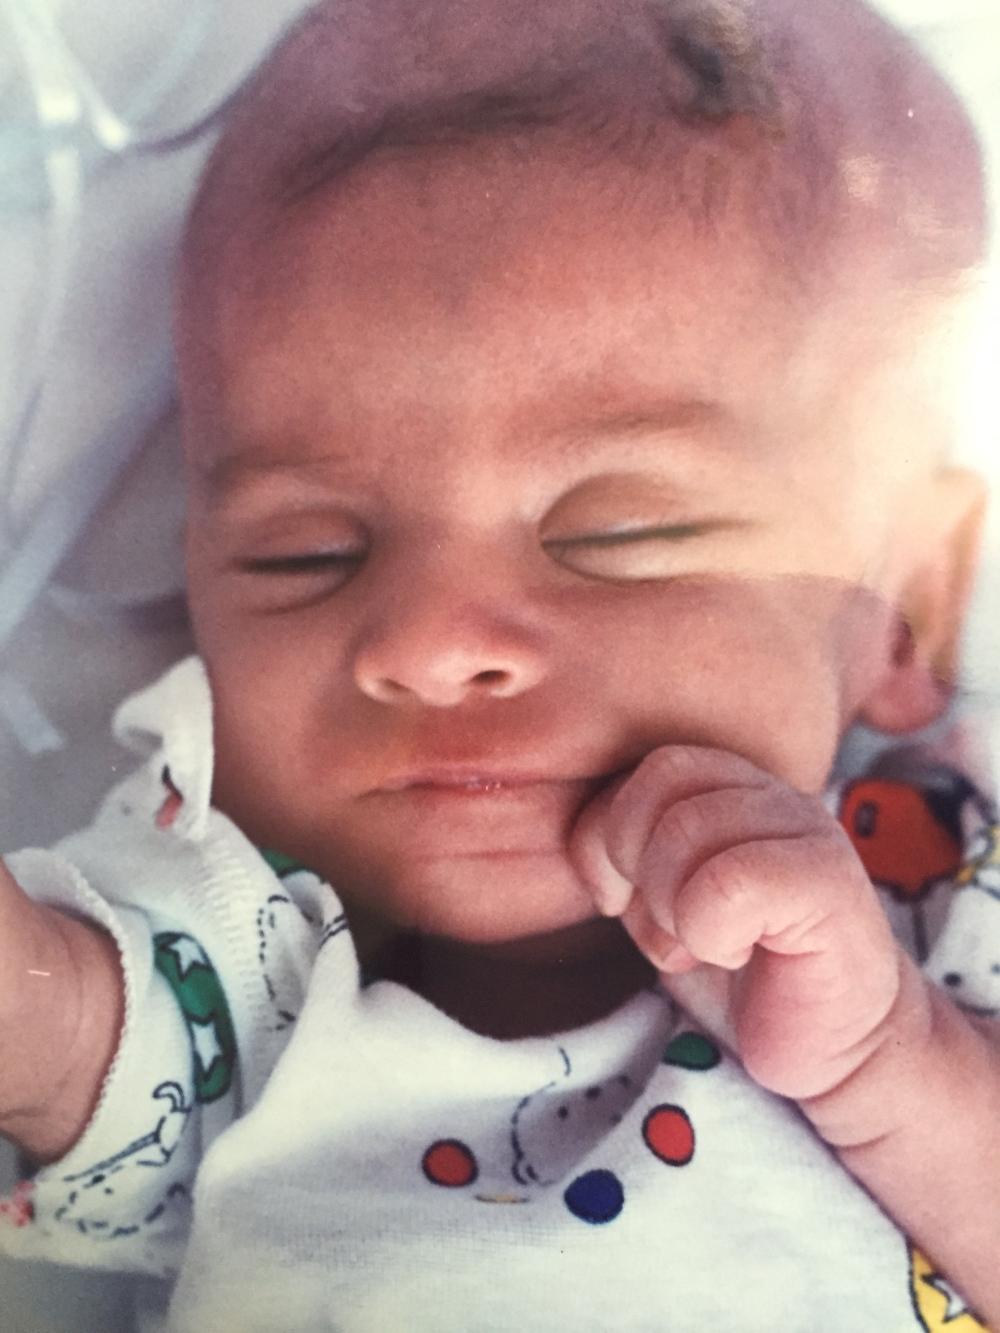 LUILLI BABY